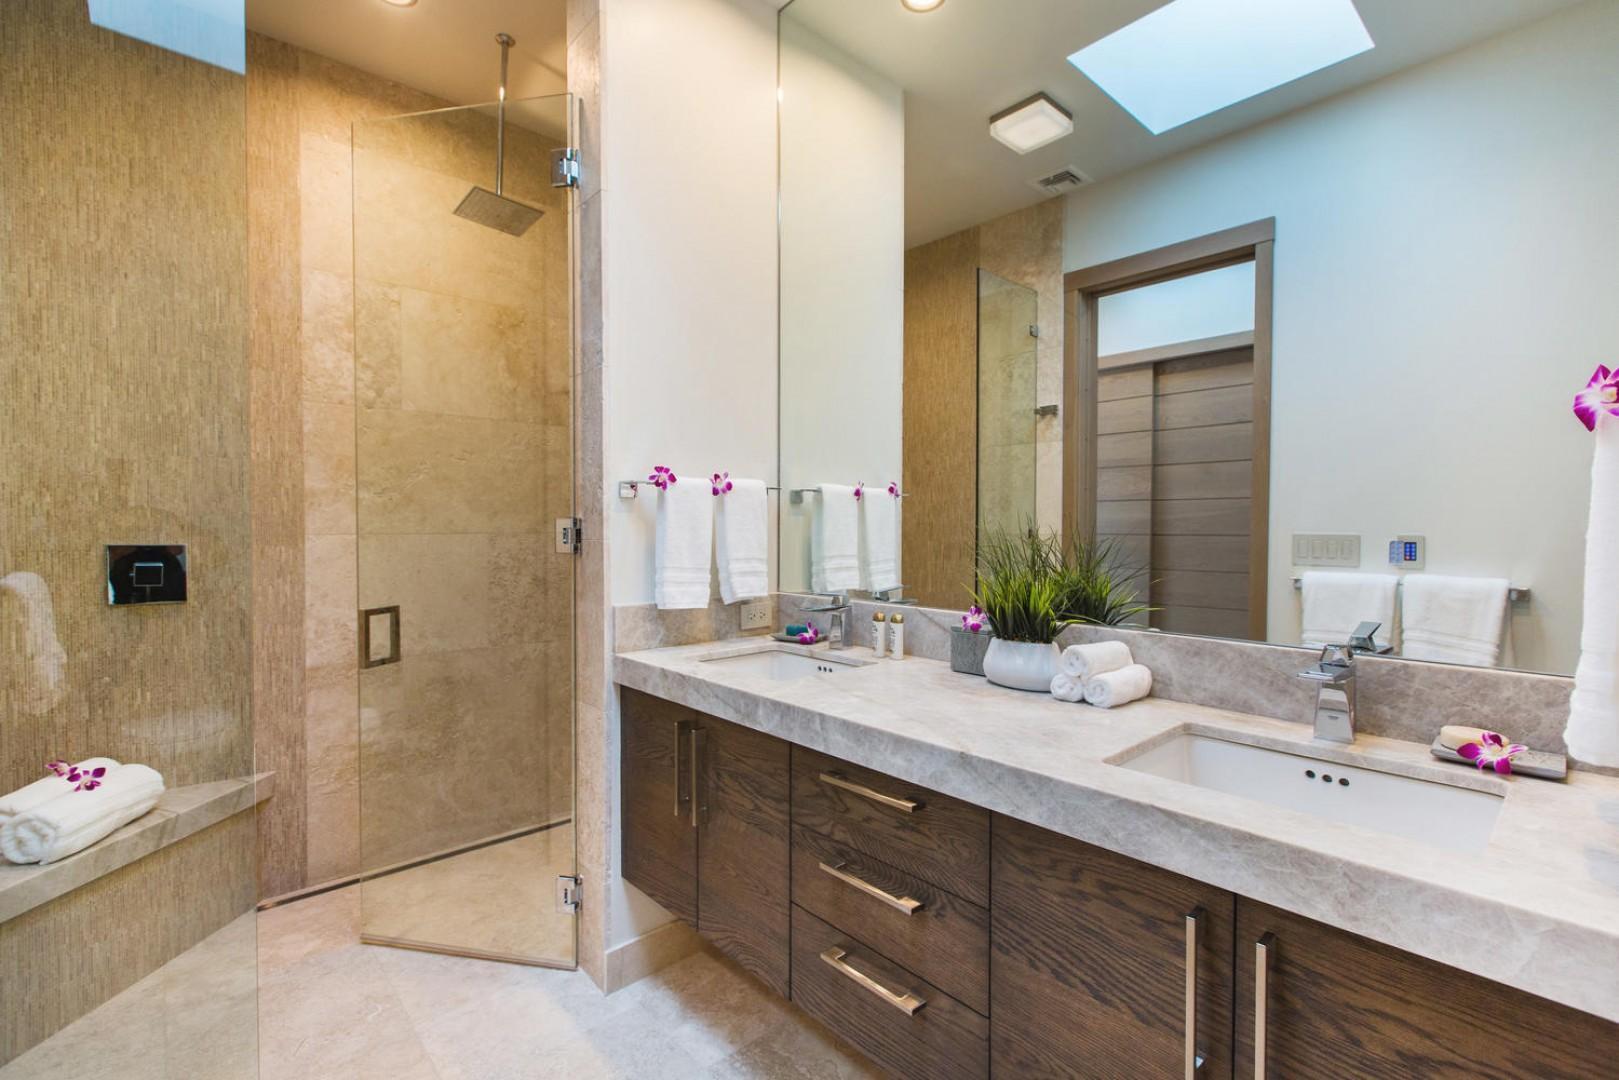 Second master bathroom.